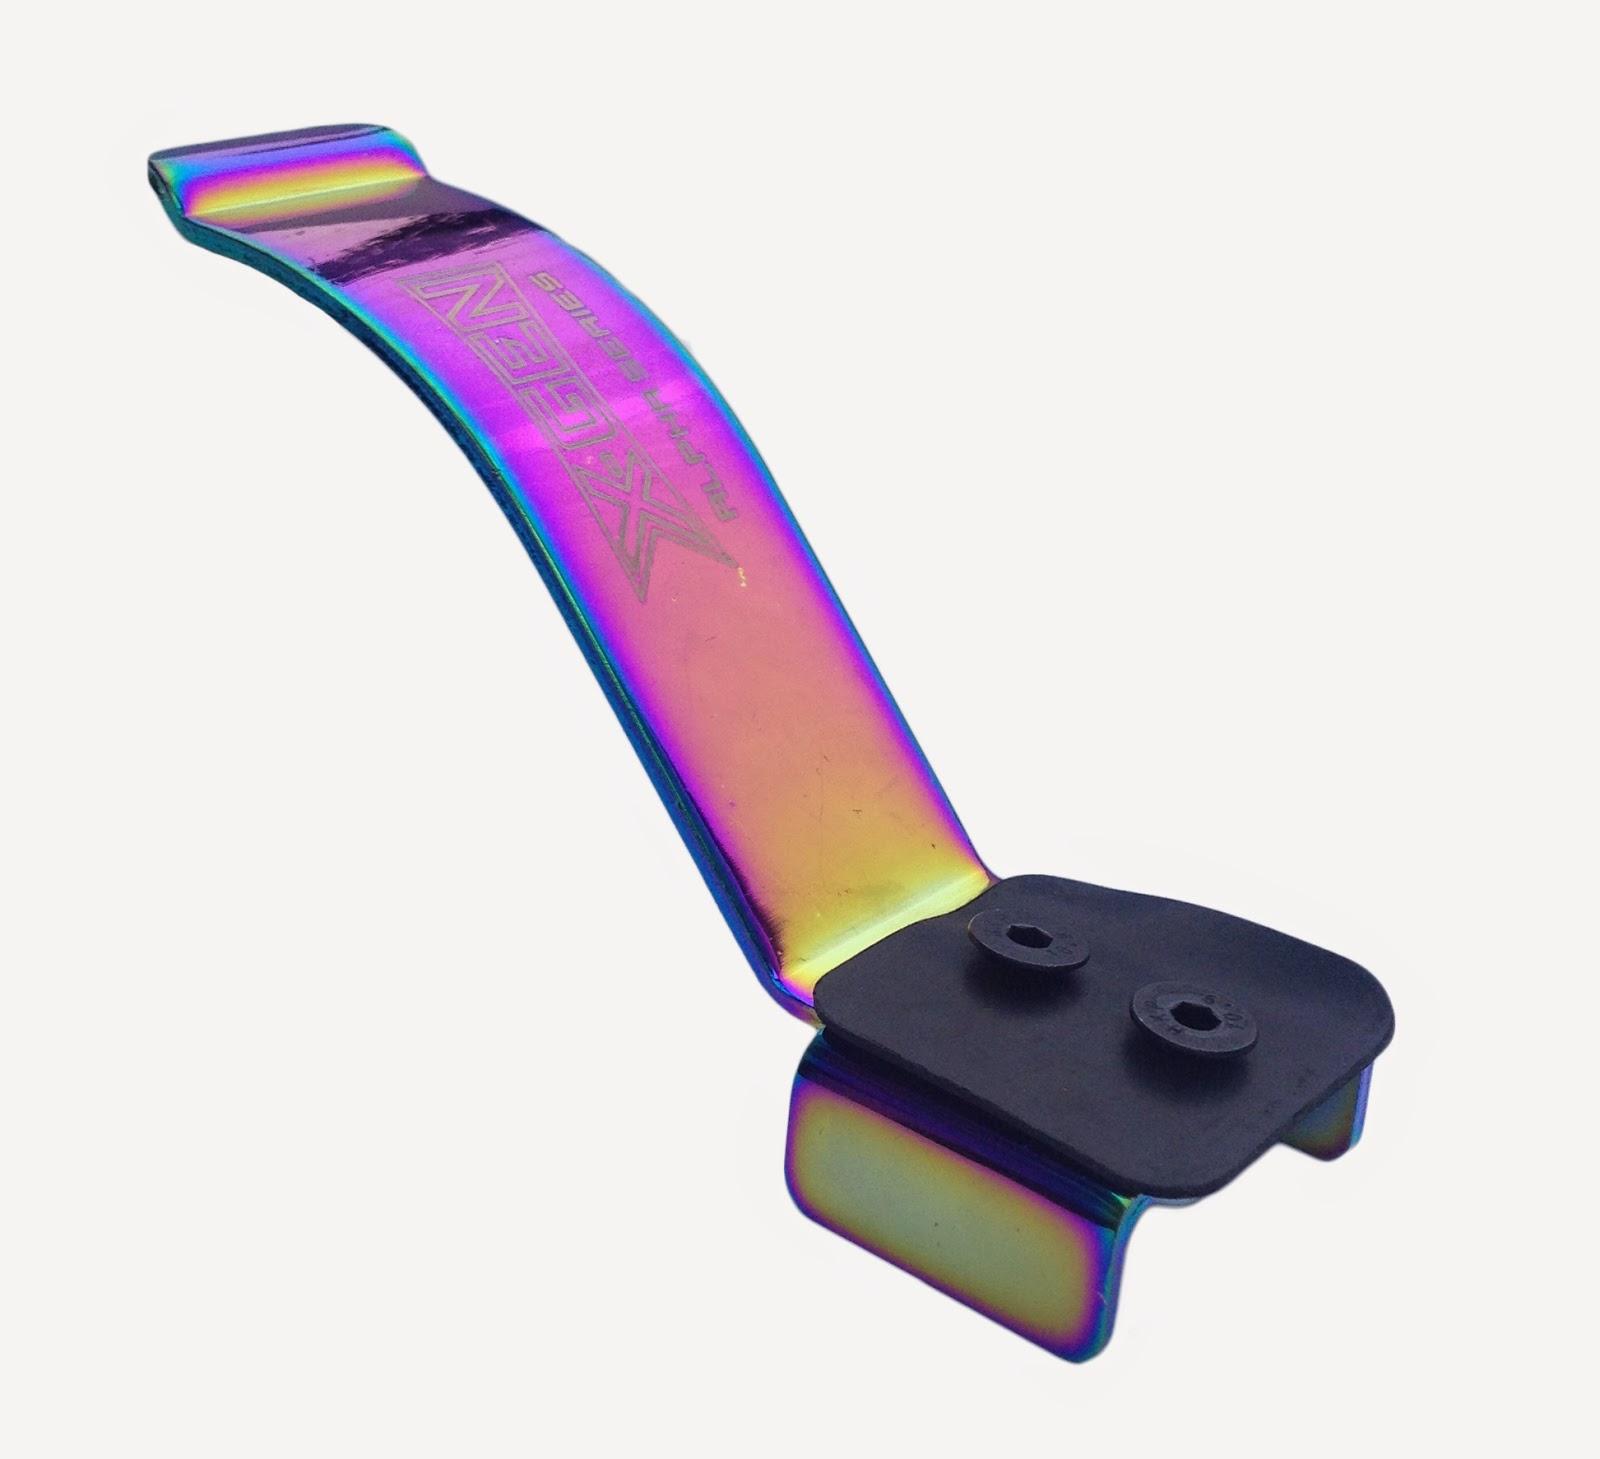 http://www.team-dogz.co.uk/product/rainbow-neo-chrome-flexi-brake